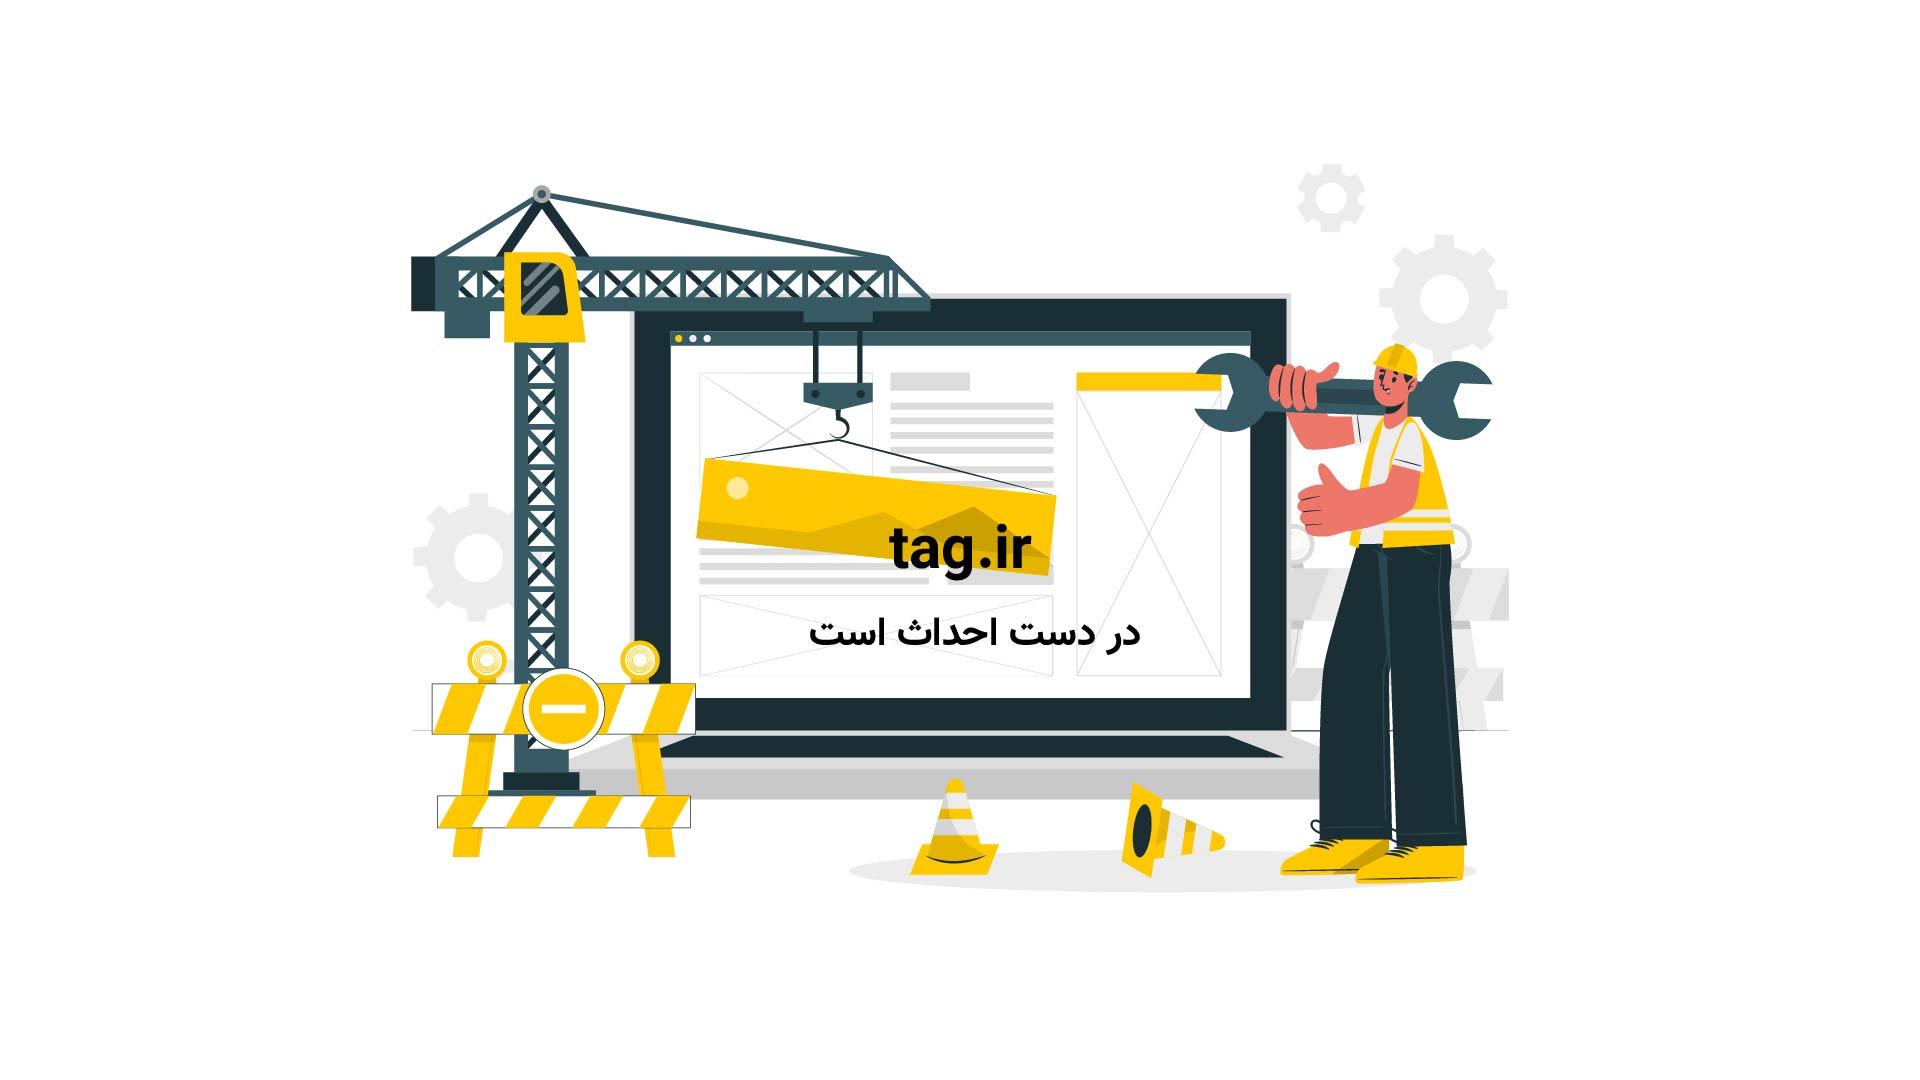 غذا خوردن حیوانات | تگ